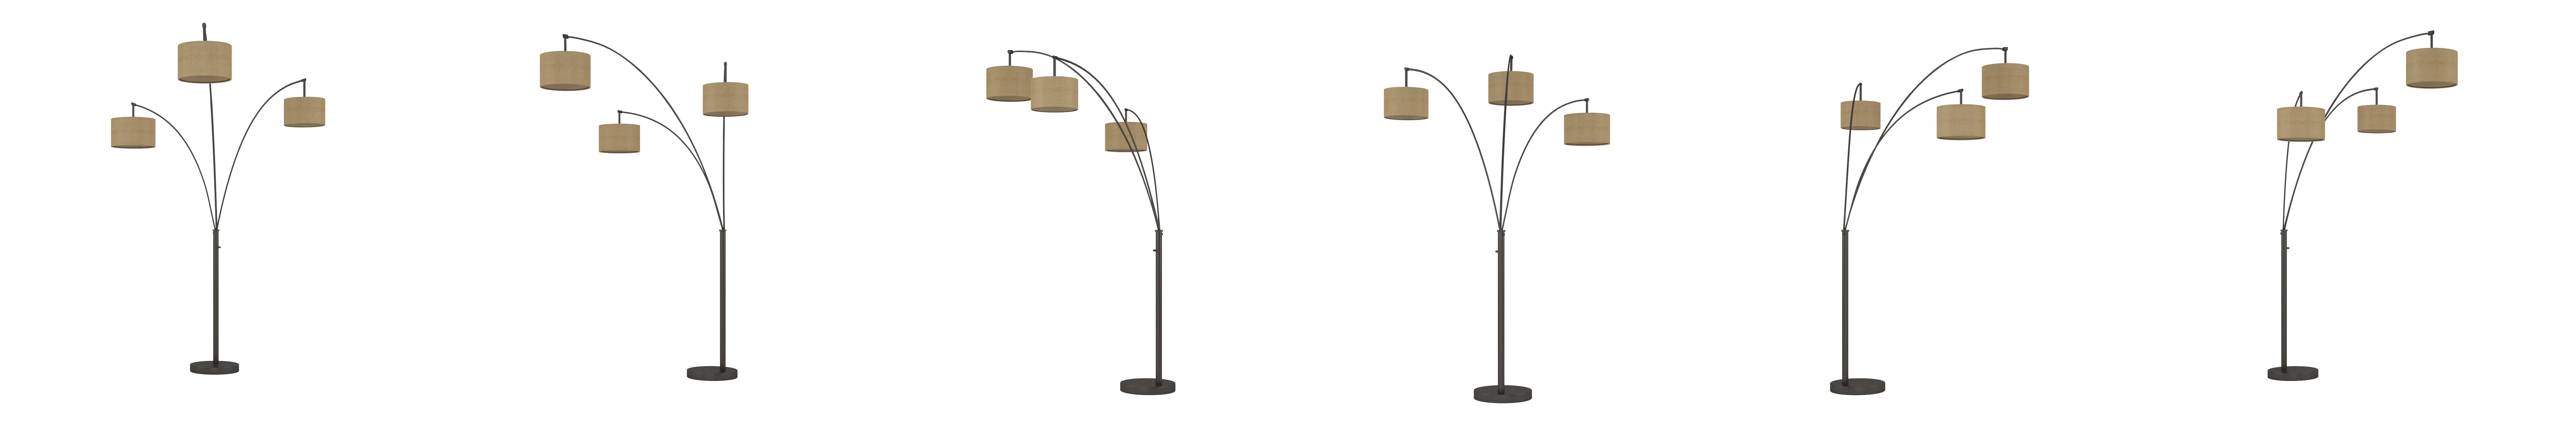 Amazon Com Artiva Usa Led602108fbz Lumiere Modern Arch Floor Lamp With Dimmer 80 Antique Bronze Home Improvement